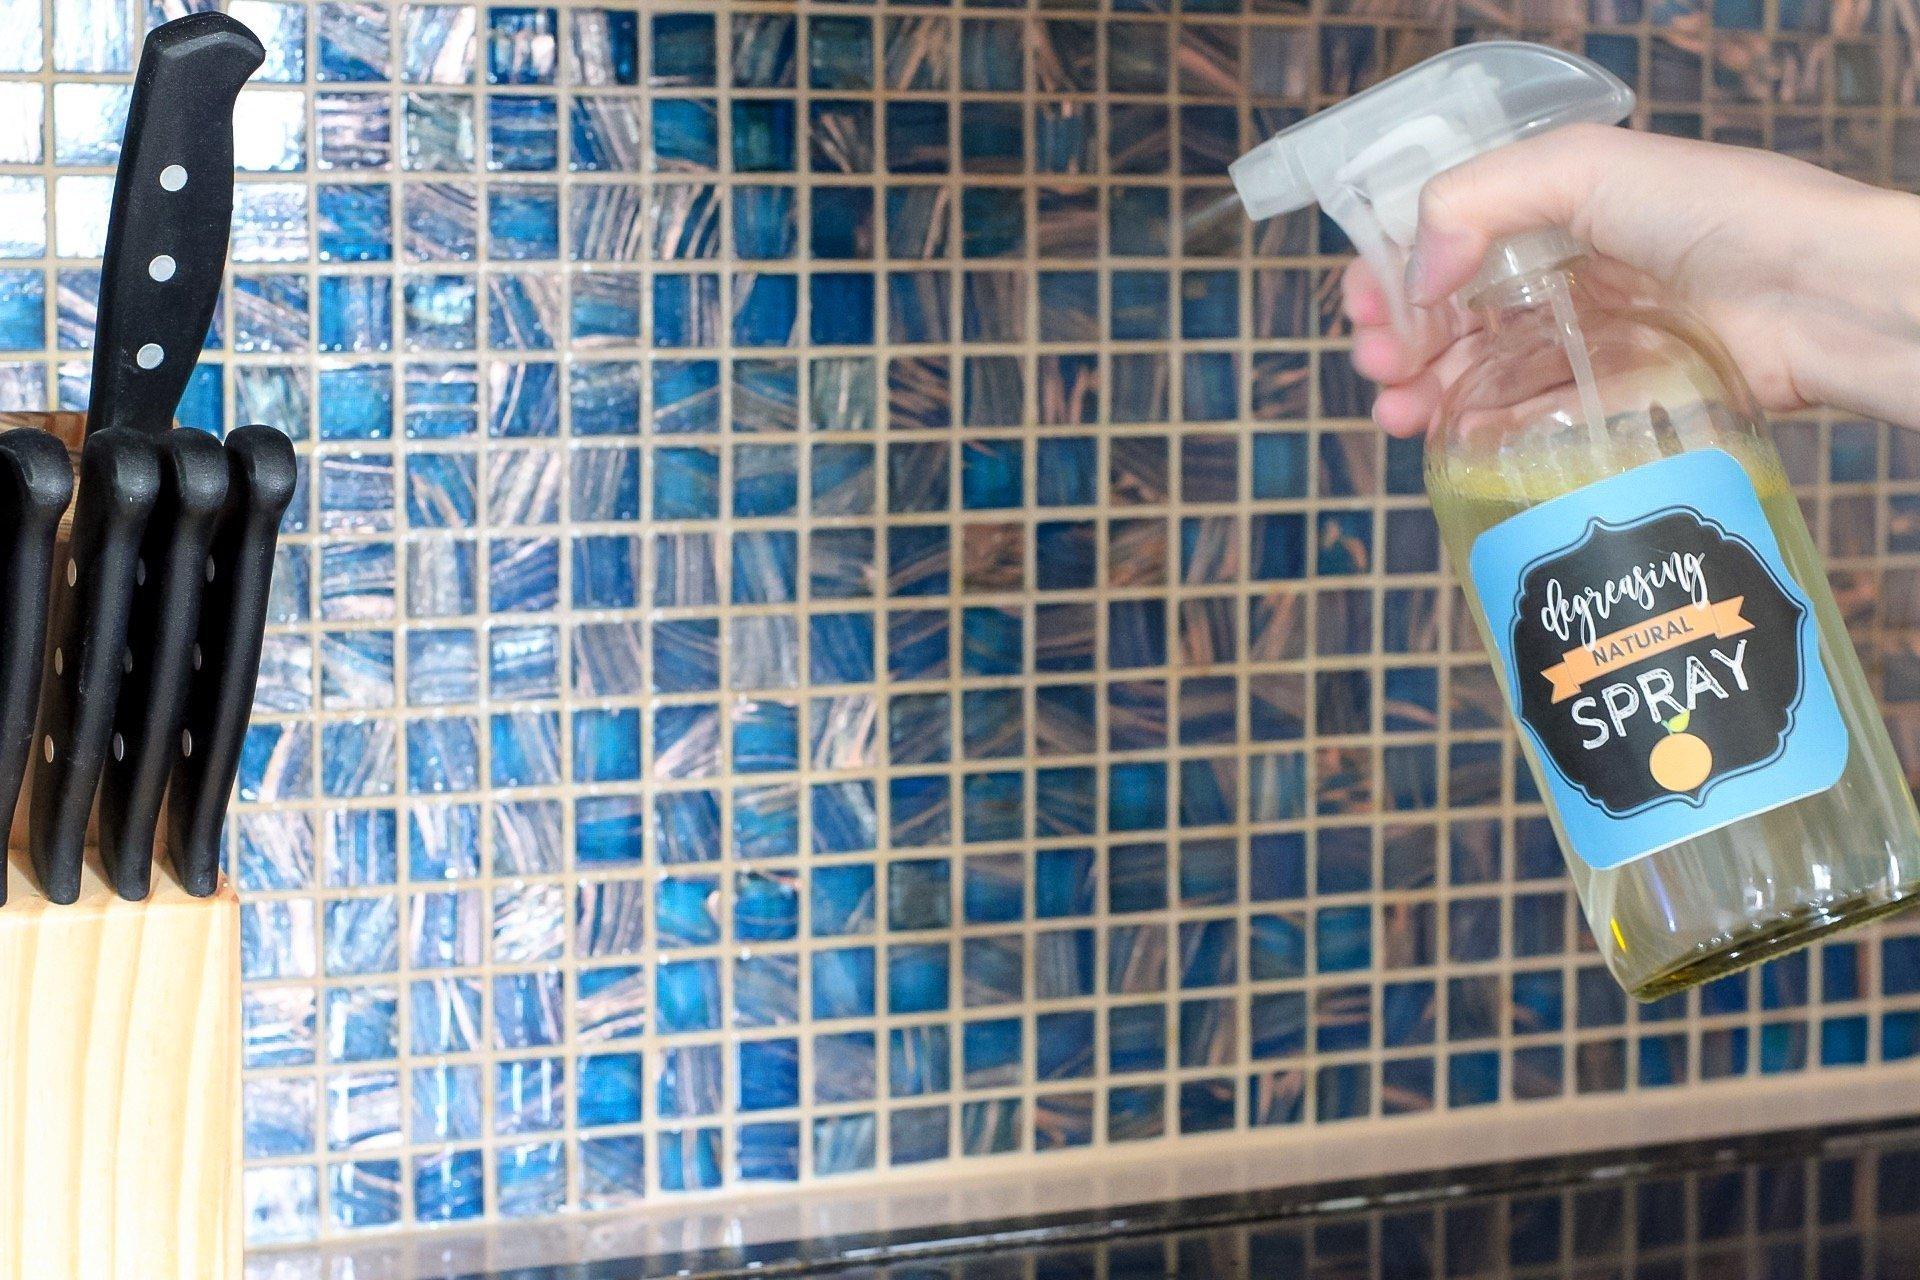 Spraying homemade kitchen degreaser onto kitchen backsplash